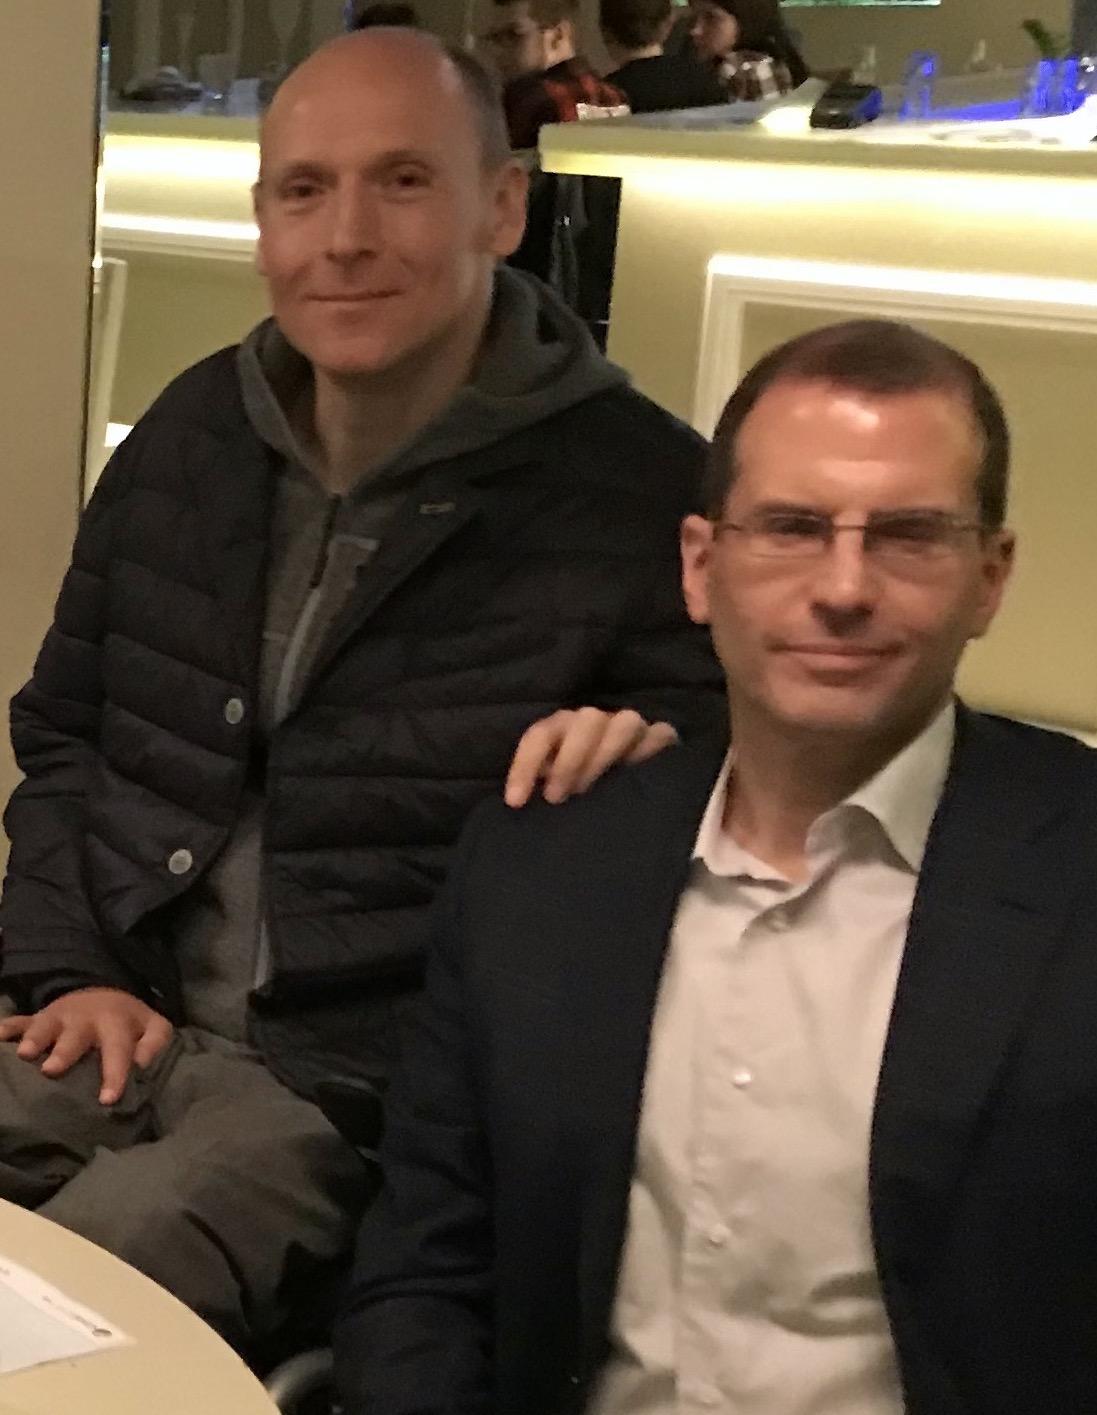 Piotr Pawlowski and Robert Manz